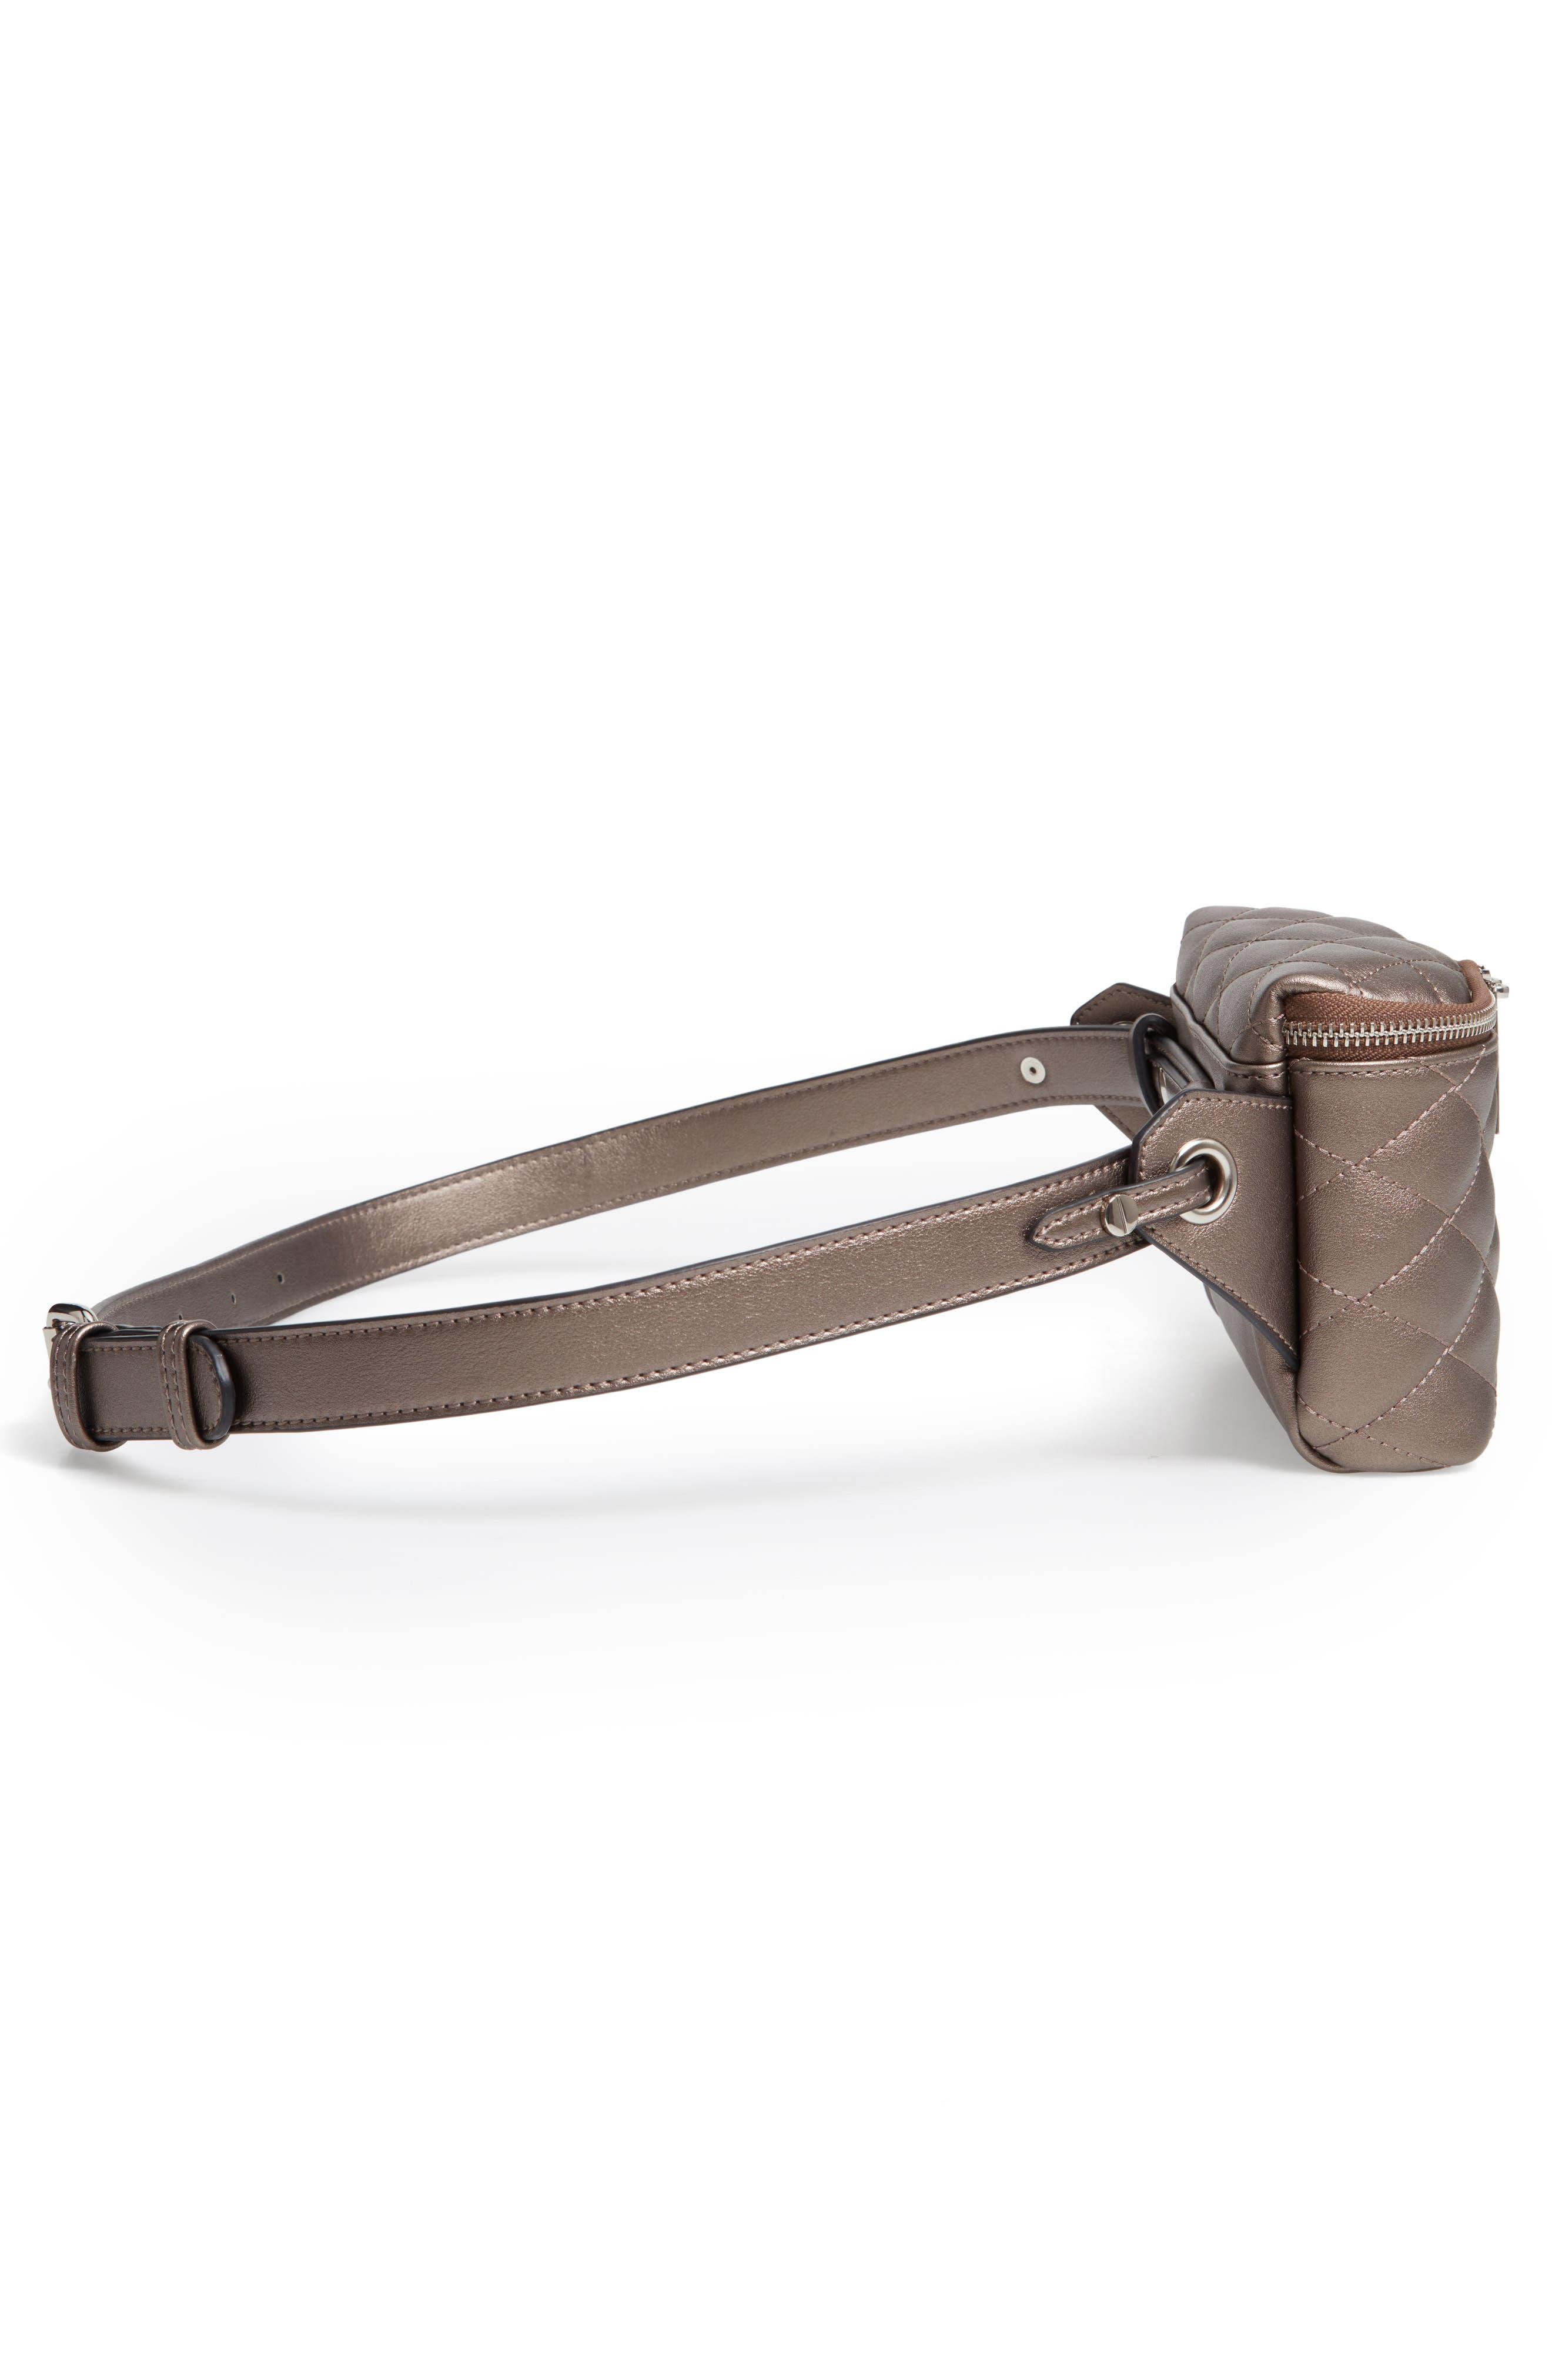 MALI + LILI,                             Faye Vegan Leather Quilted Belt Bag,                             Alternate thumbnail 6, color,                             PEWTER